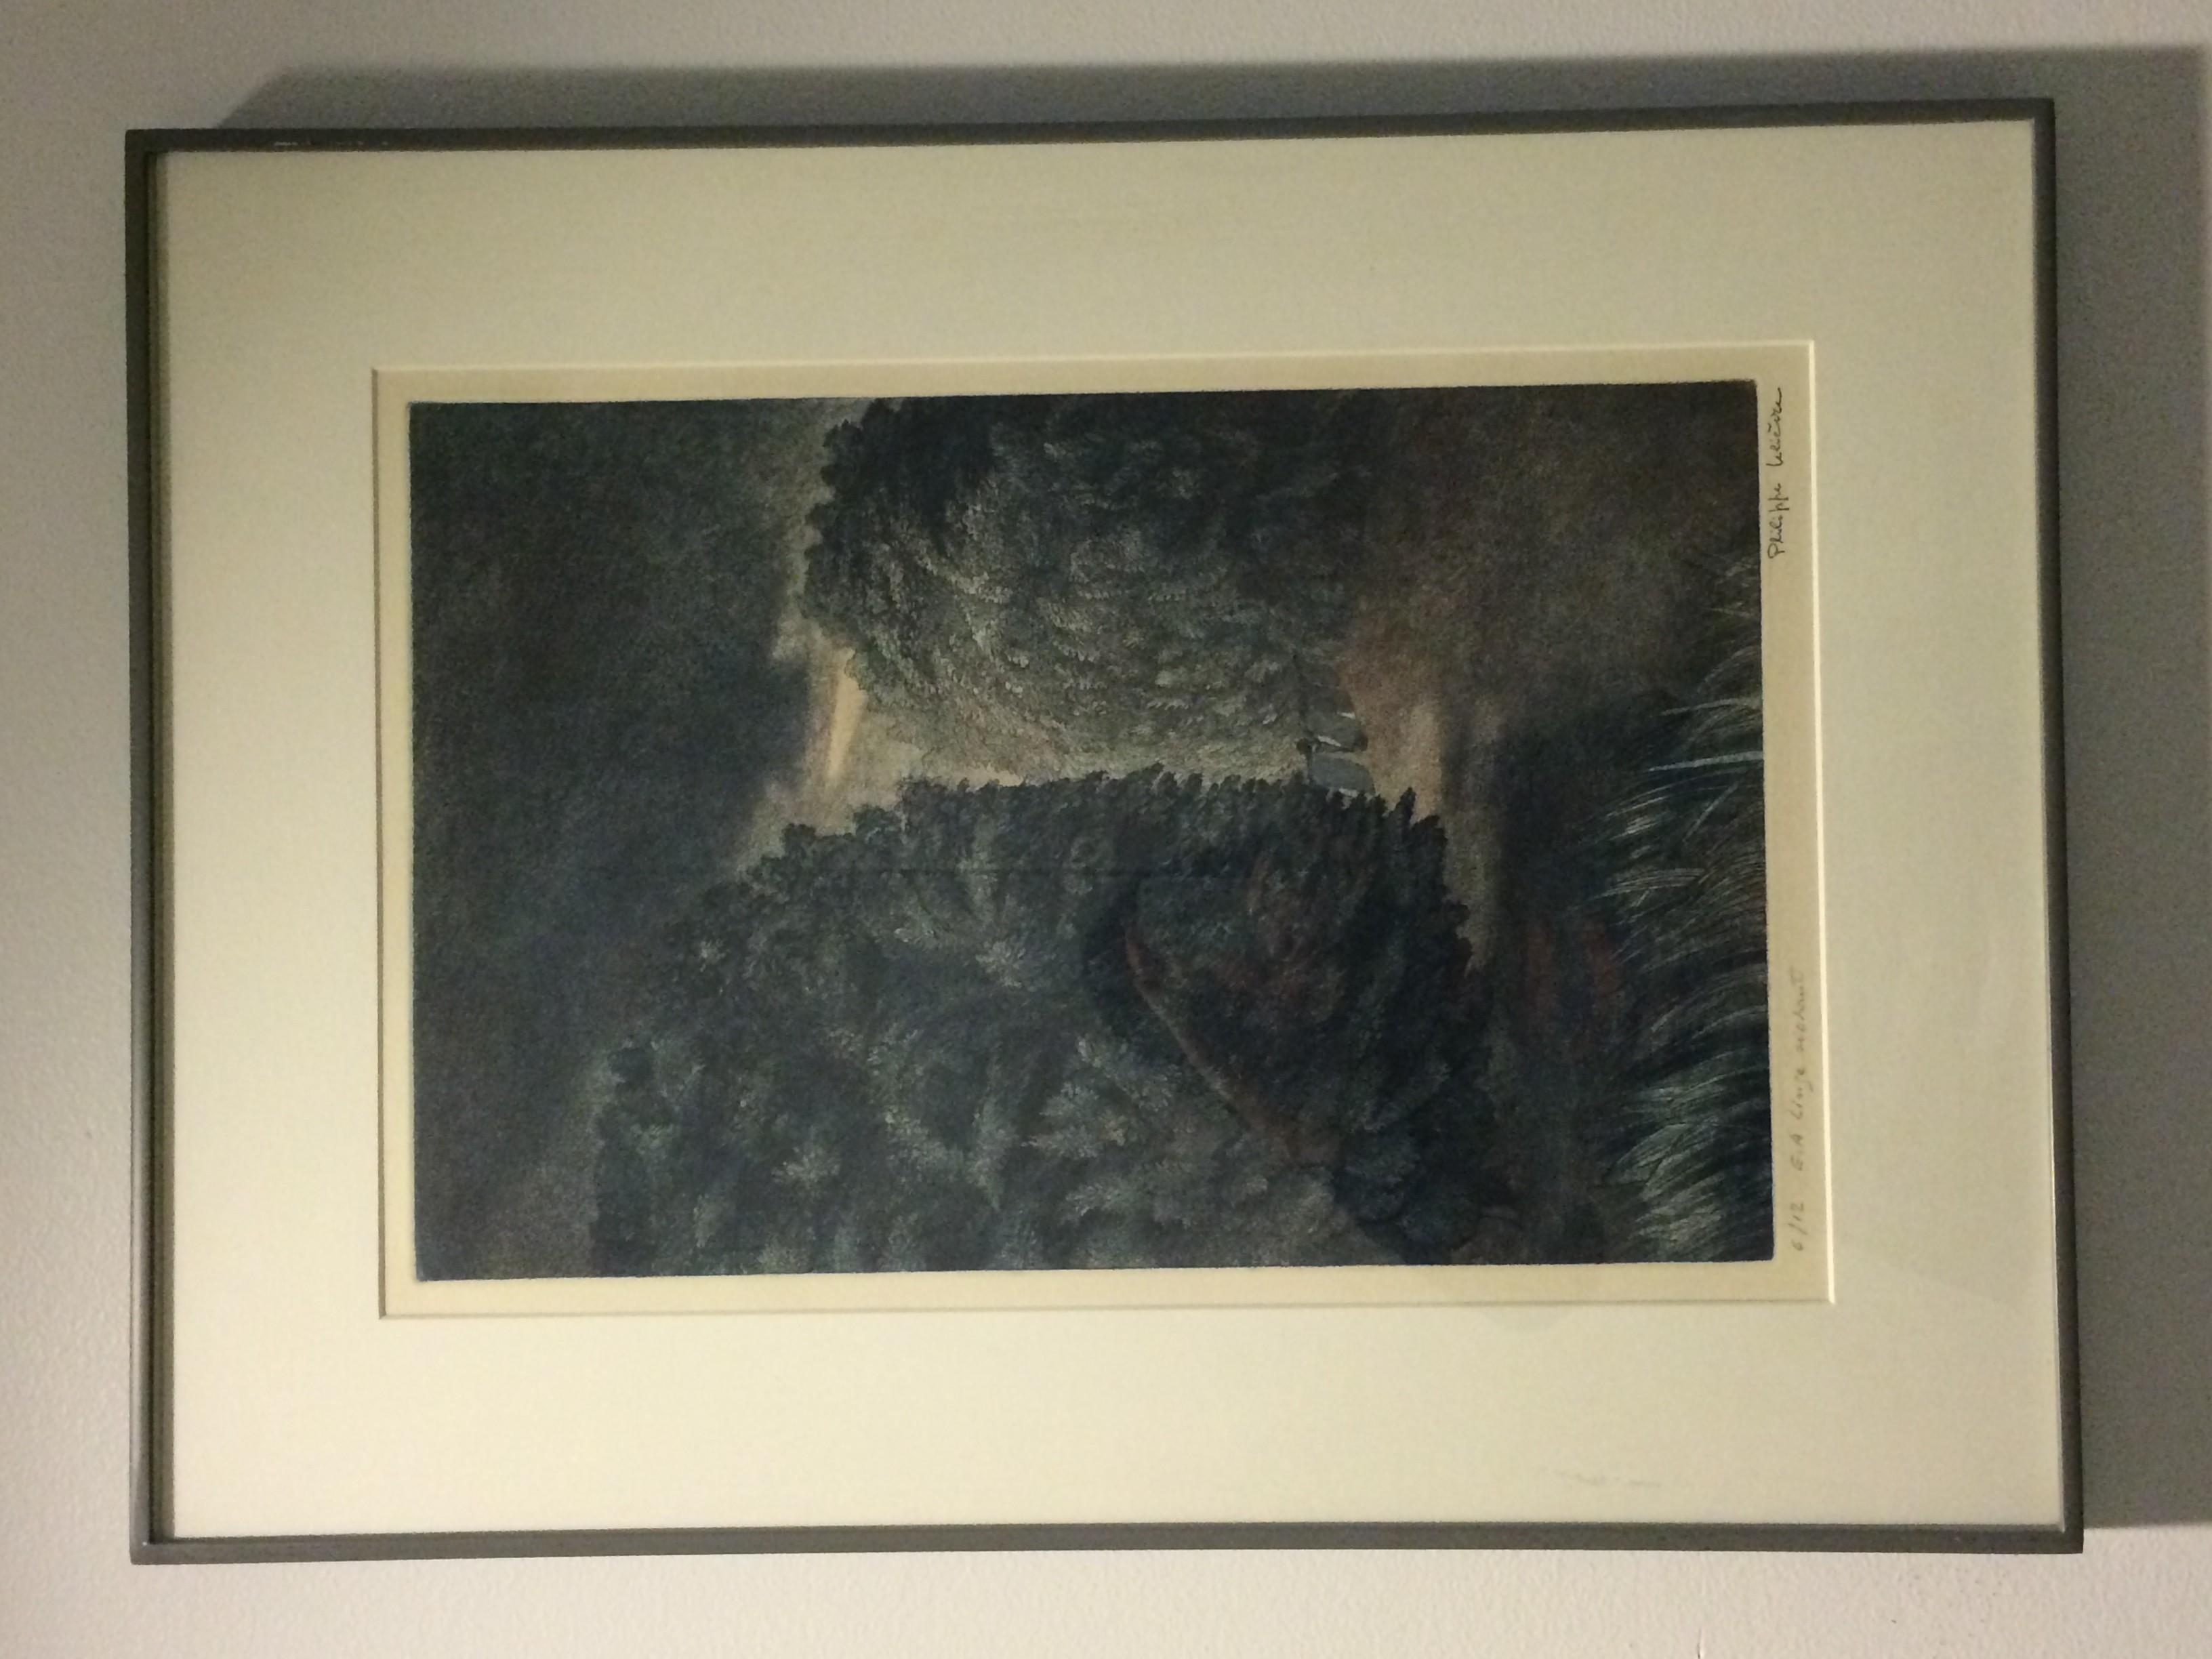 Linge Sichant by  Philippe Lelievre - Masterpiece Online